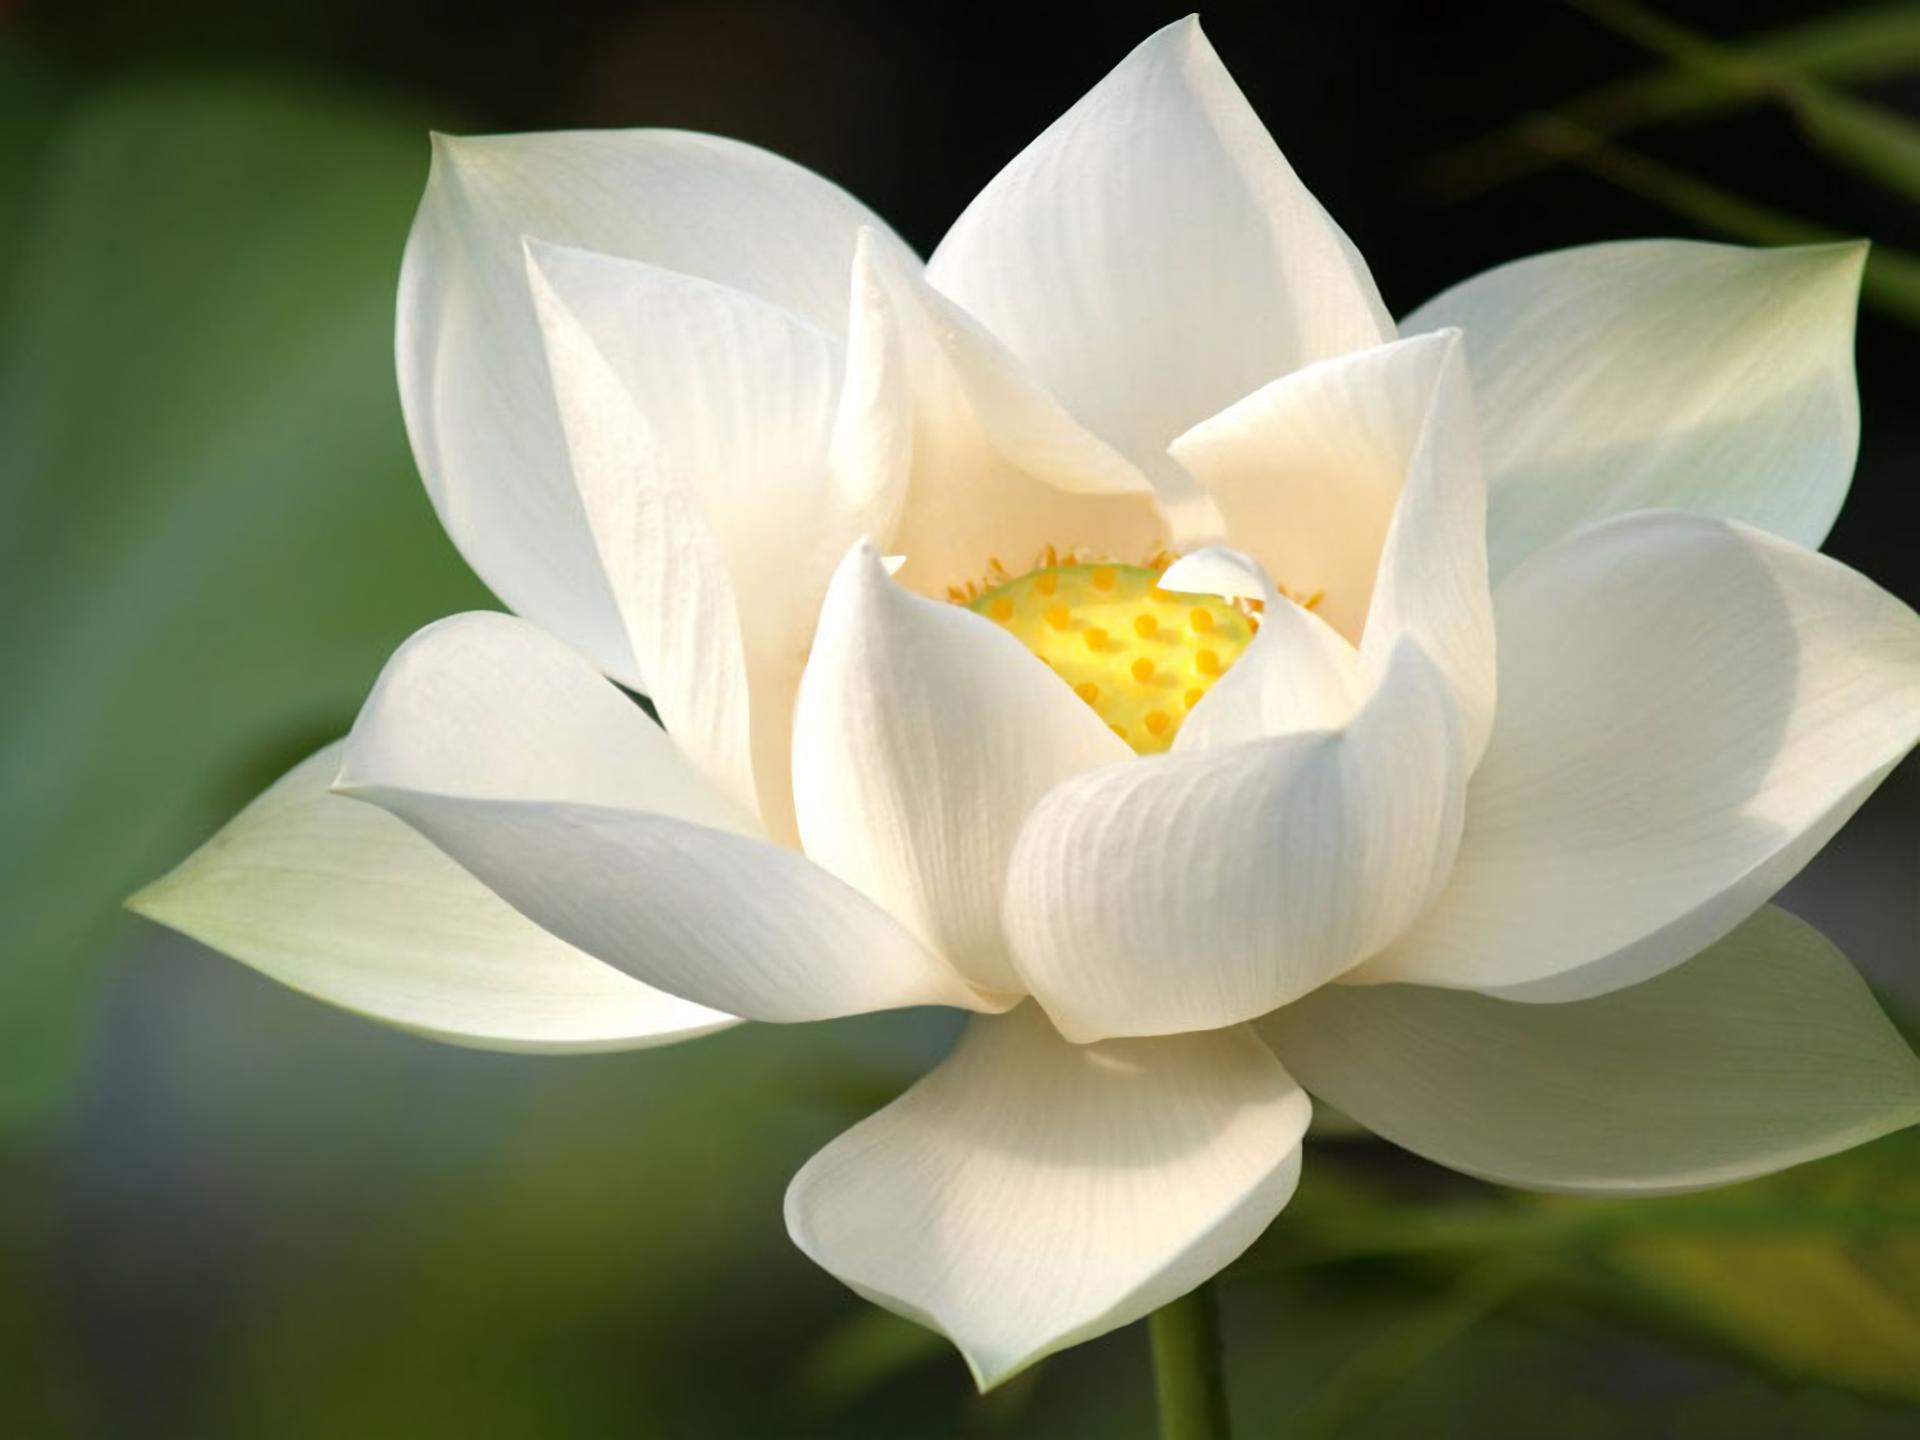 White Lotus Hd Wallpaper Background Image 1920x1440 Id899963